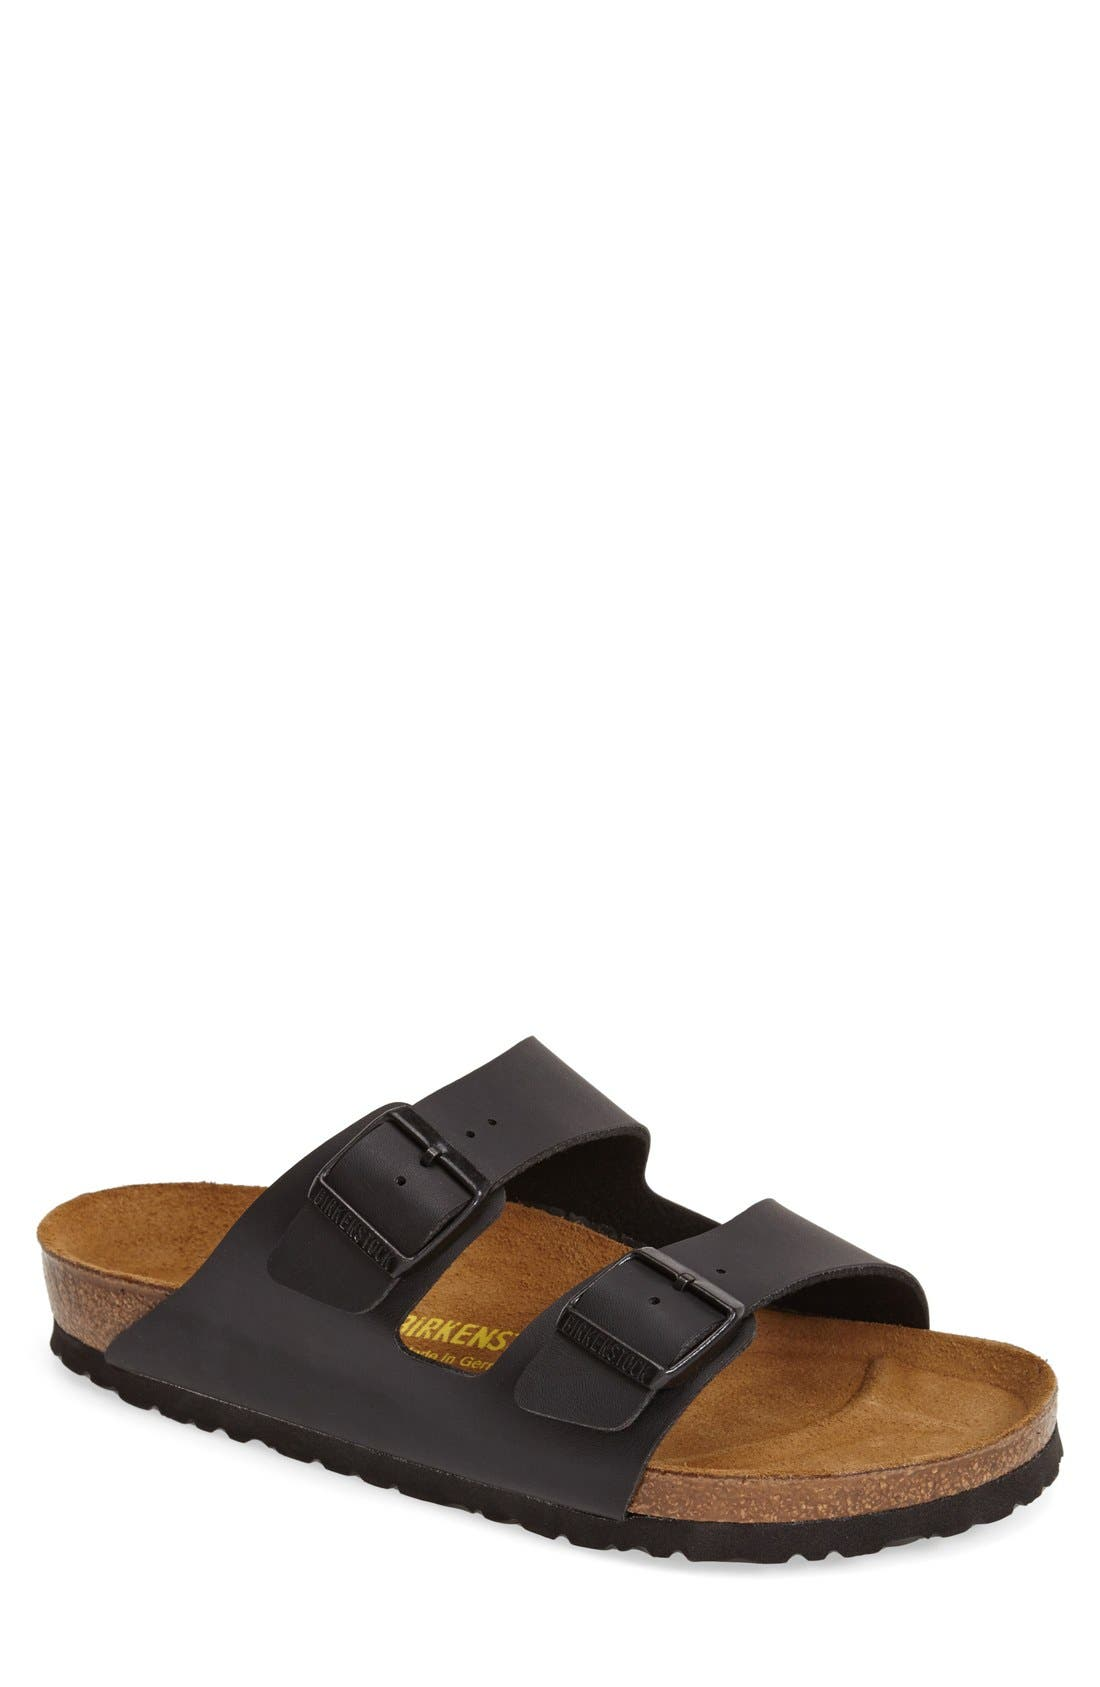 BIRKENSTOCK 'Arizona' Slide Sandal, Main, color, BLACK